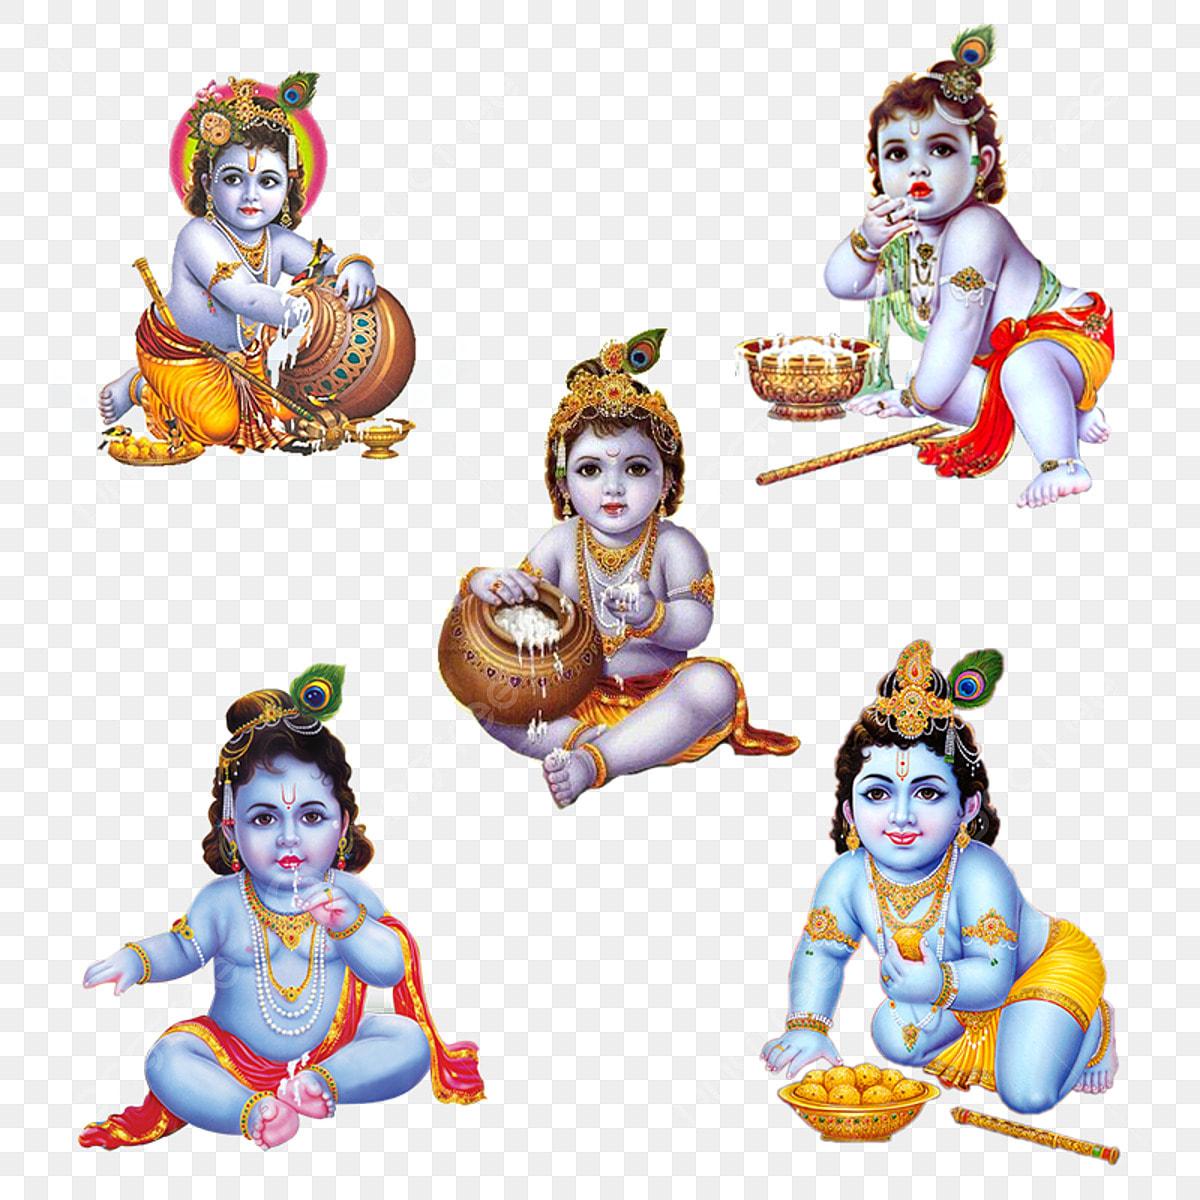 pngtree shri krishna image png image 3618928